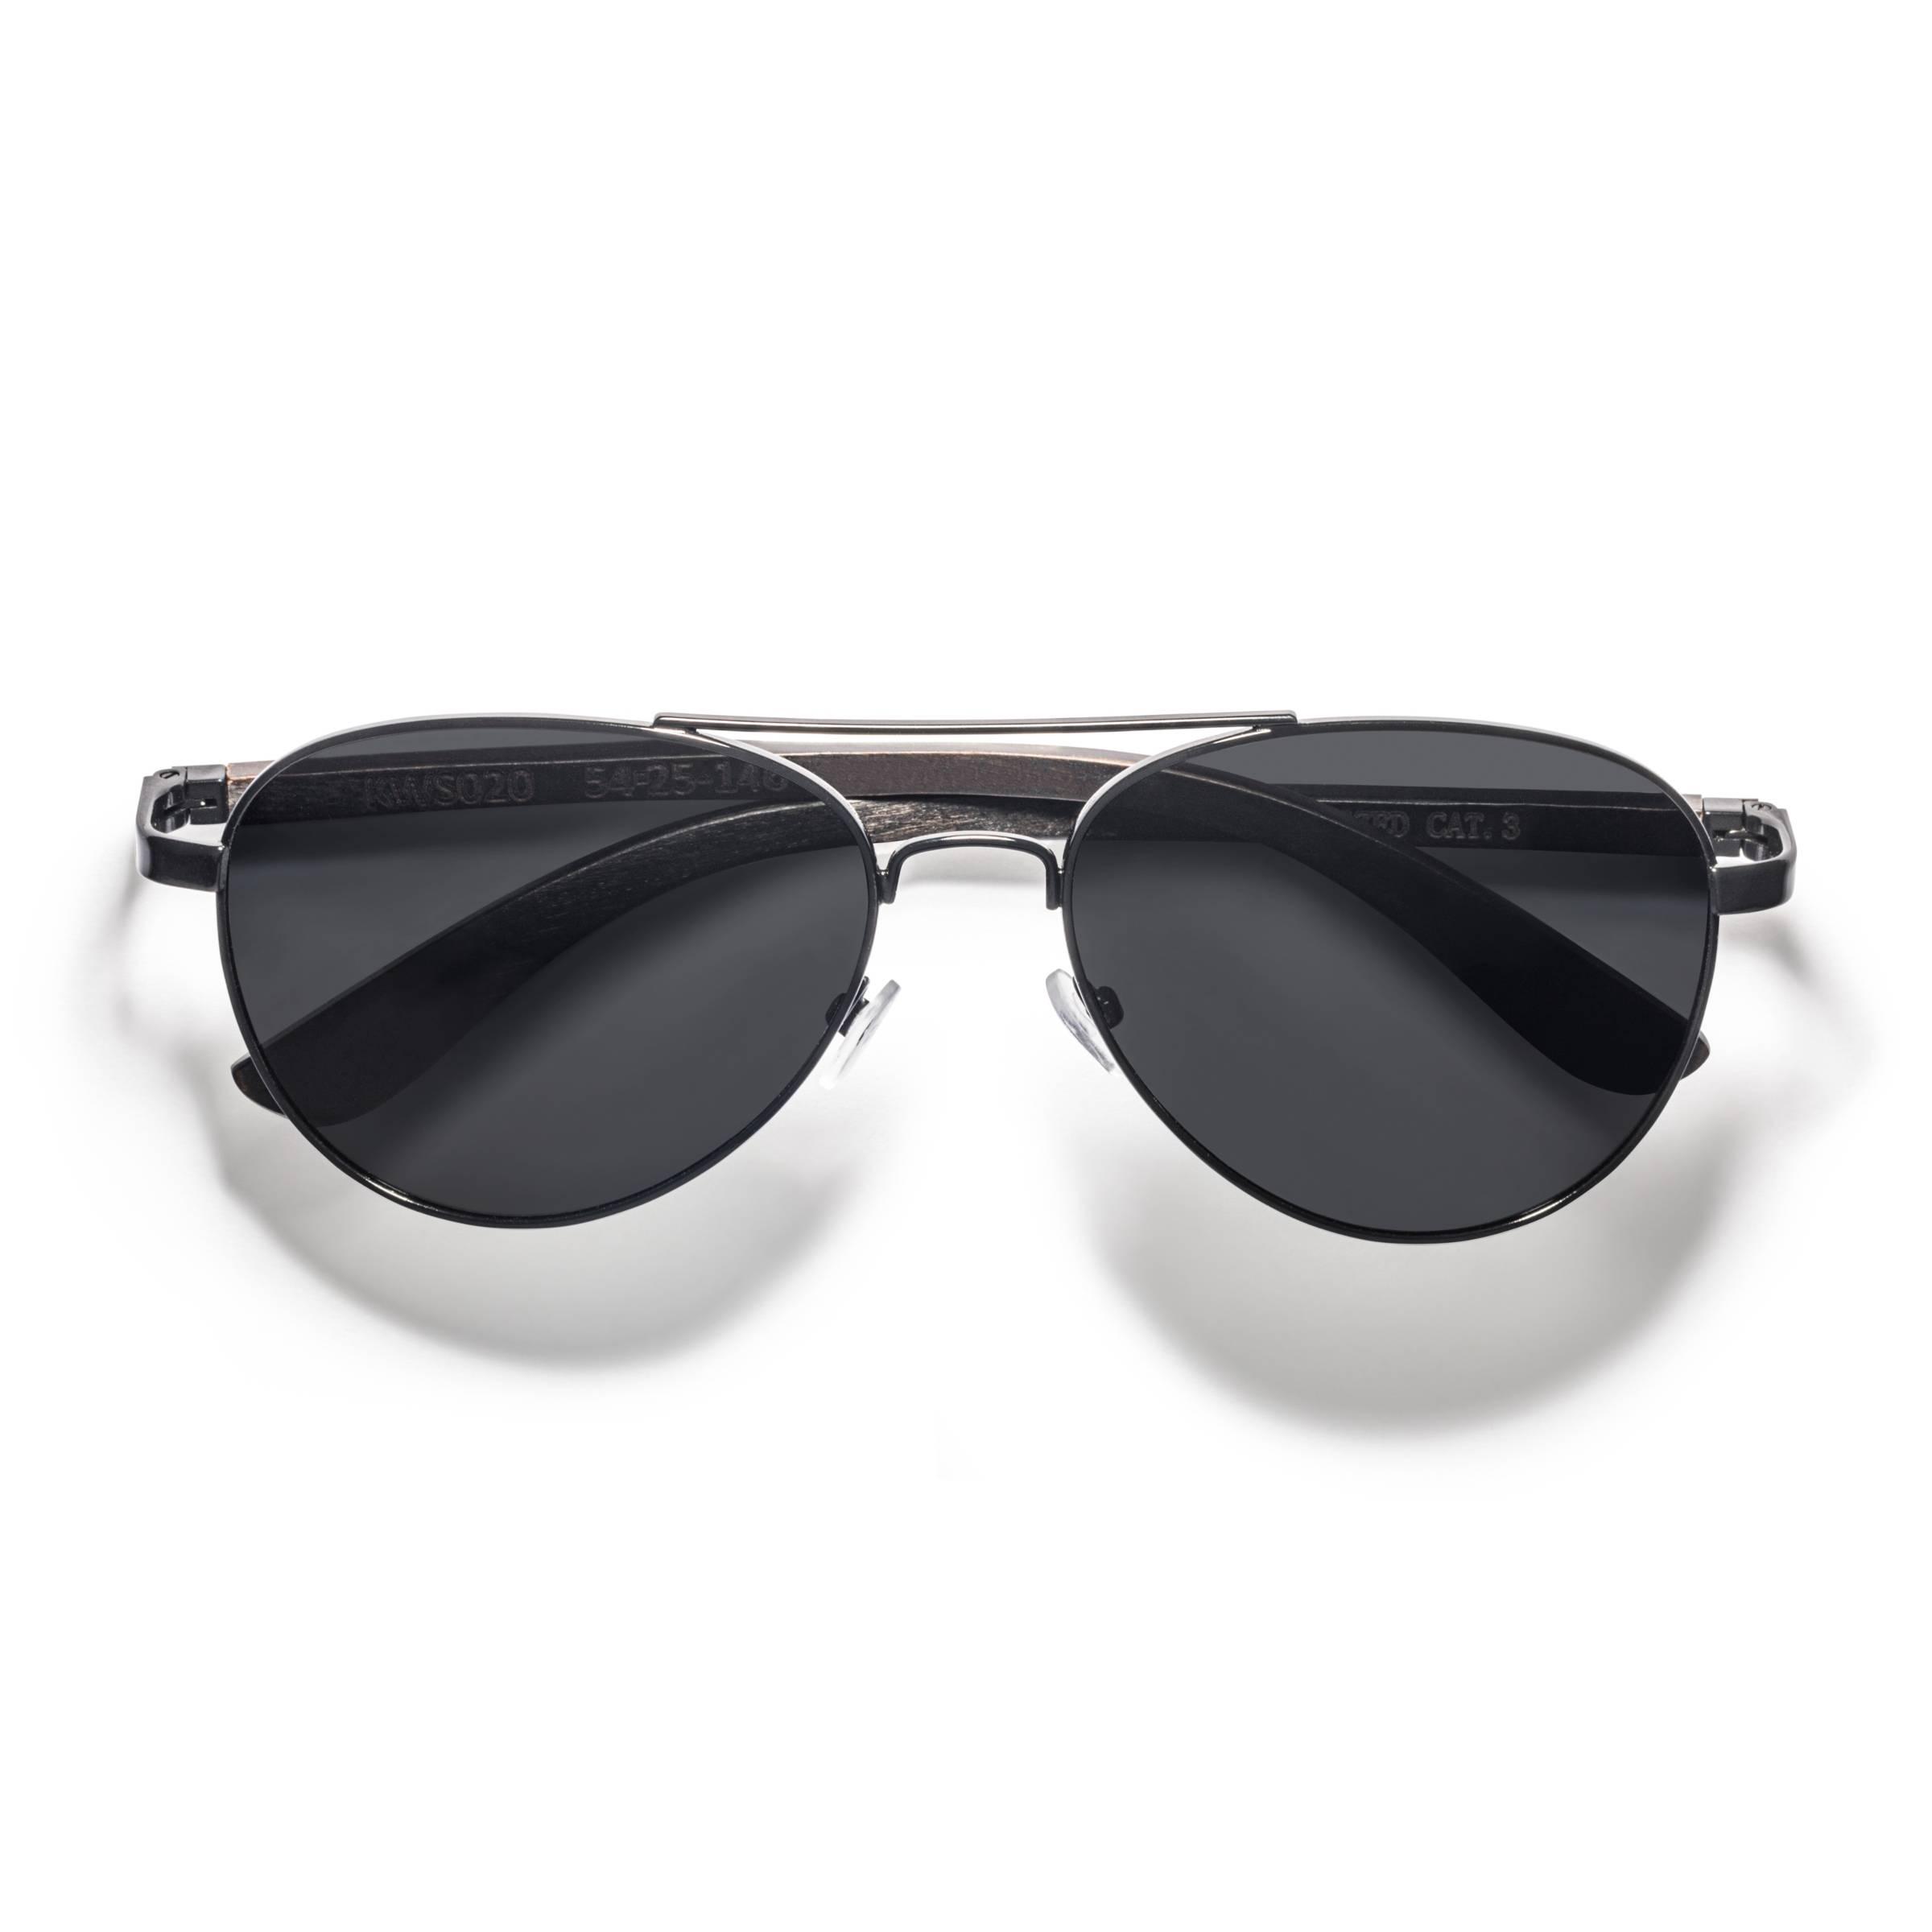 Kraywoods Leo, Aviator sunglasses made from ebony wood with polarized dark lenses